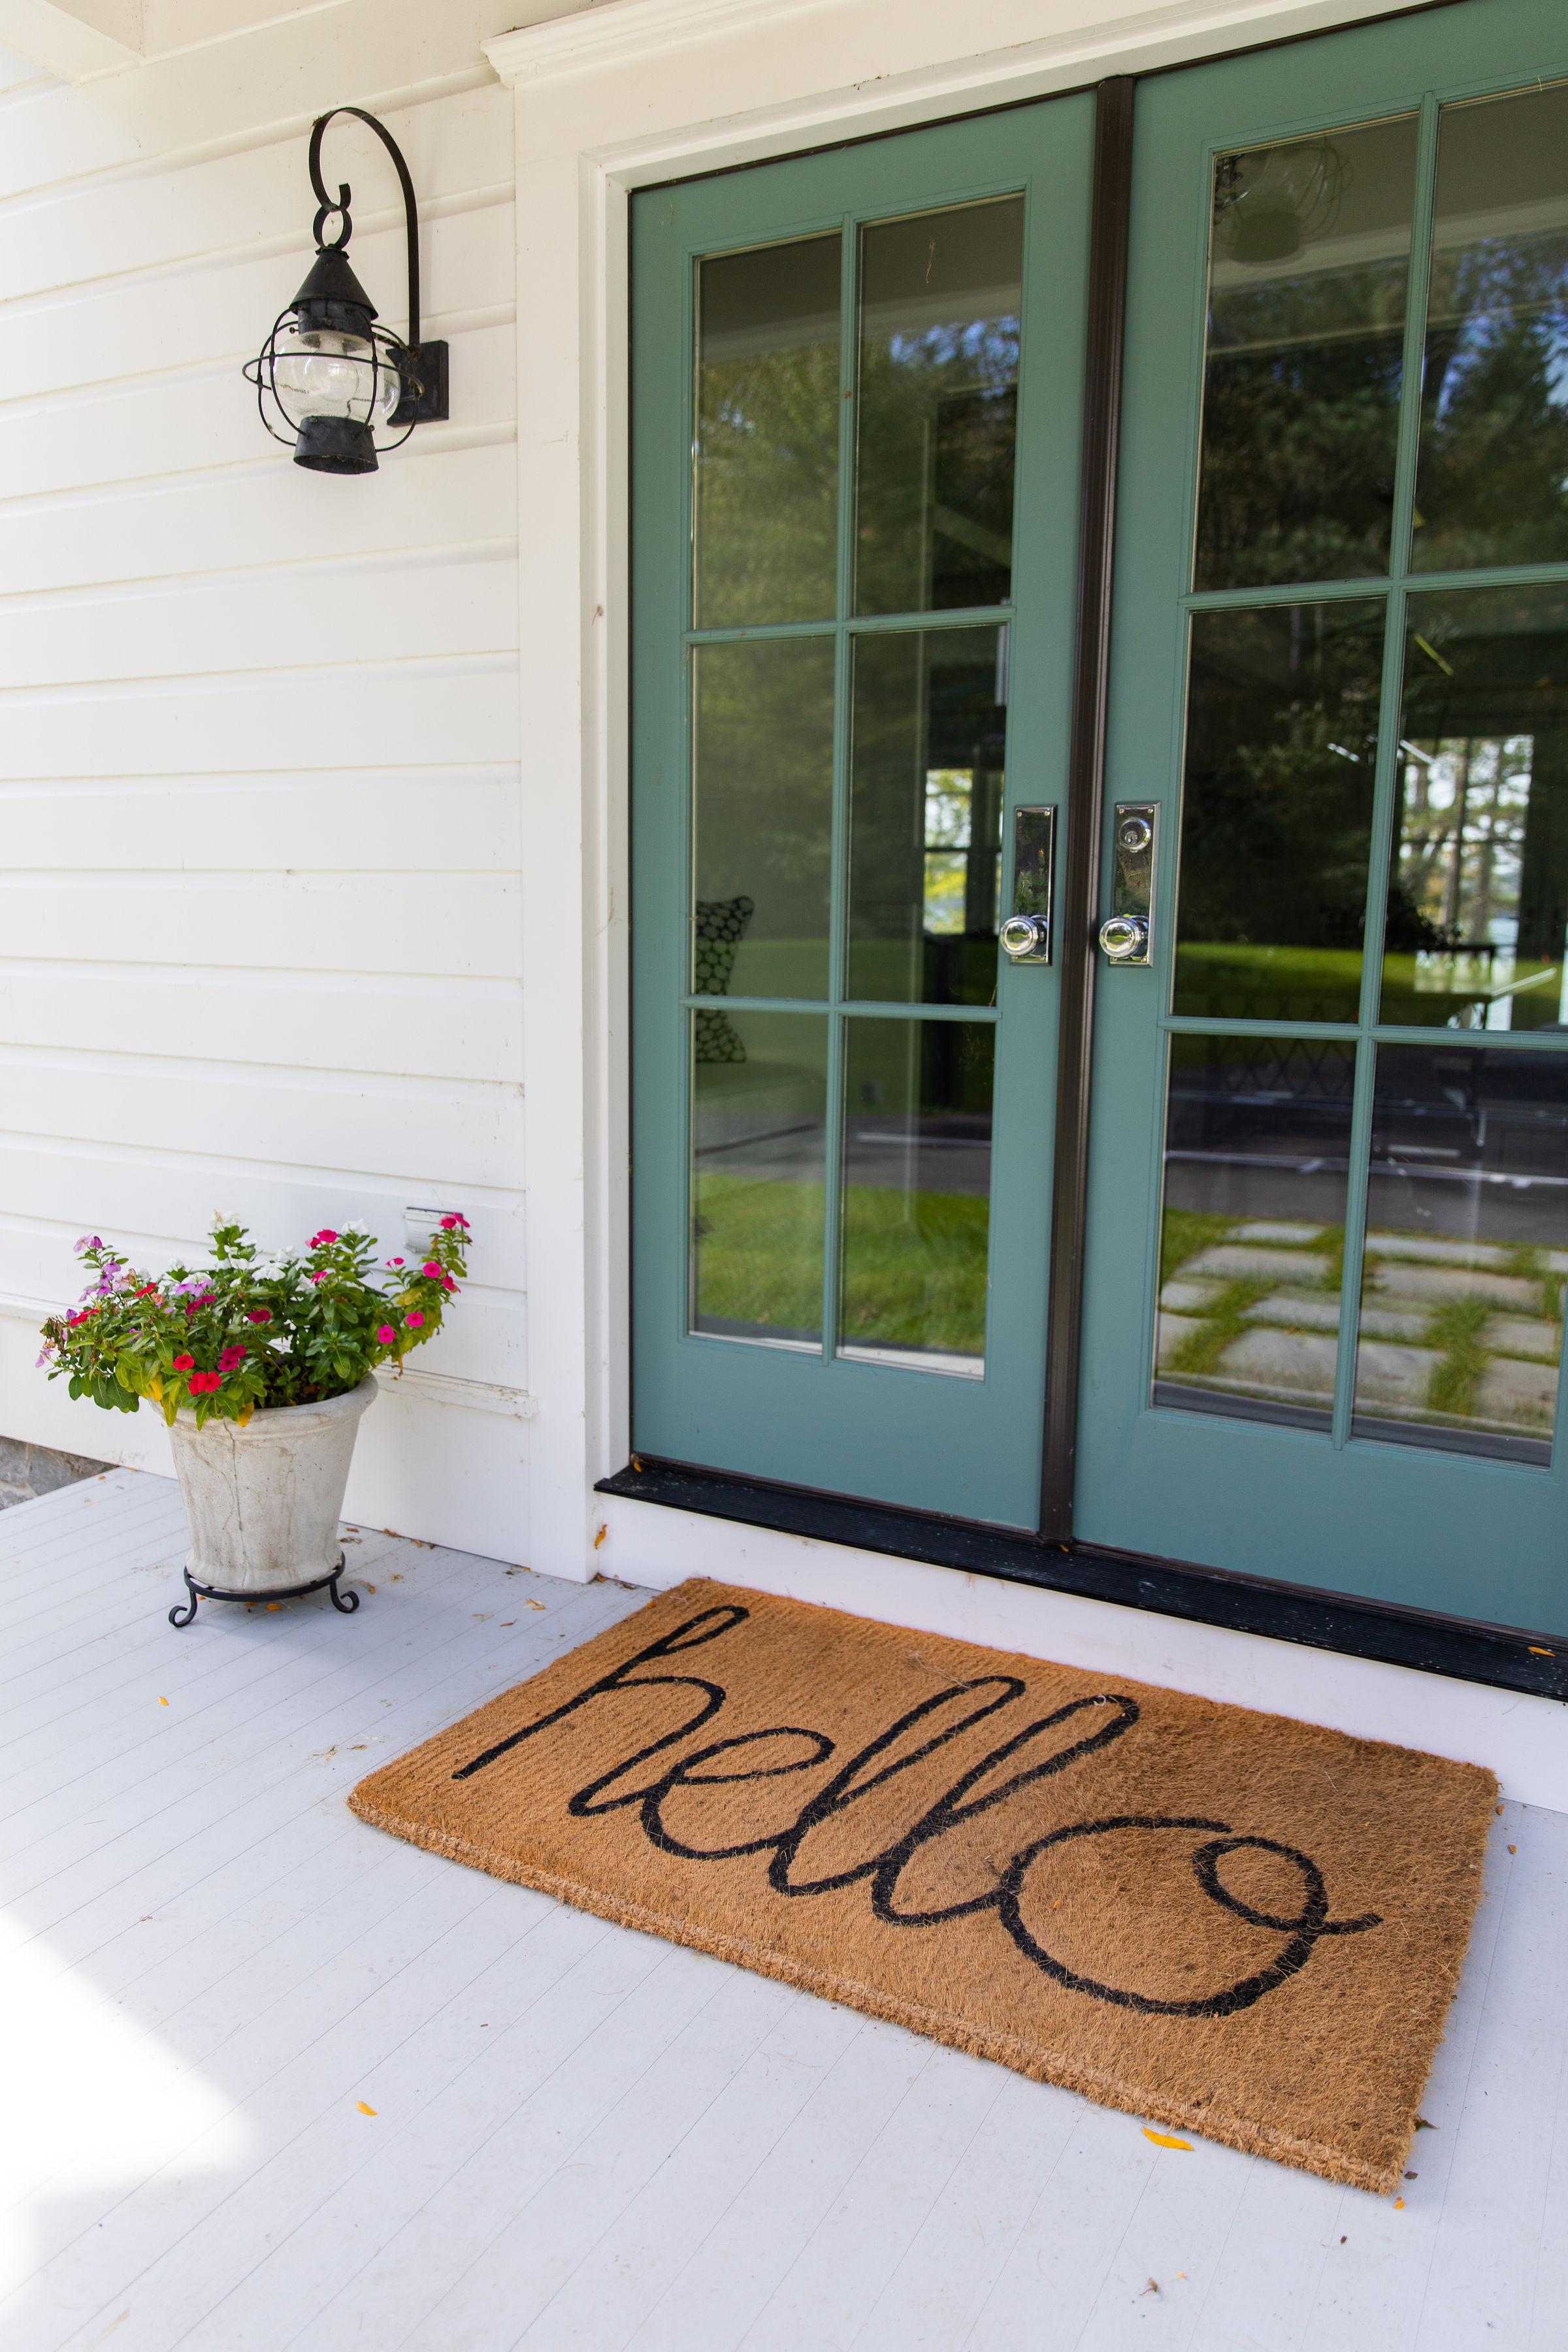 Cottage interior design style by Skaneateles interior designer, Teaselwood Design